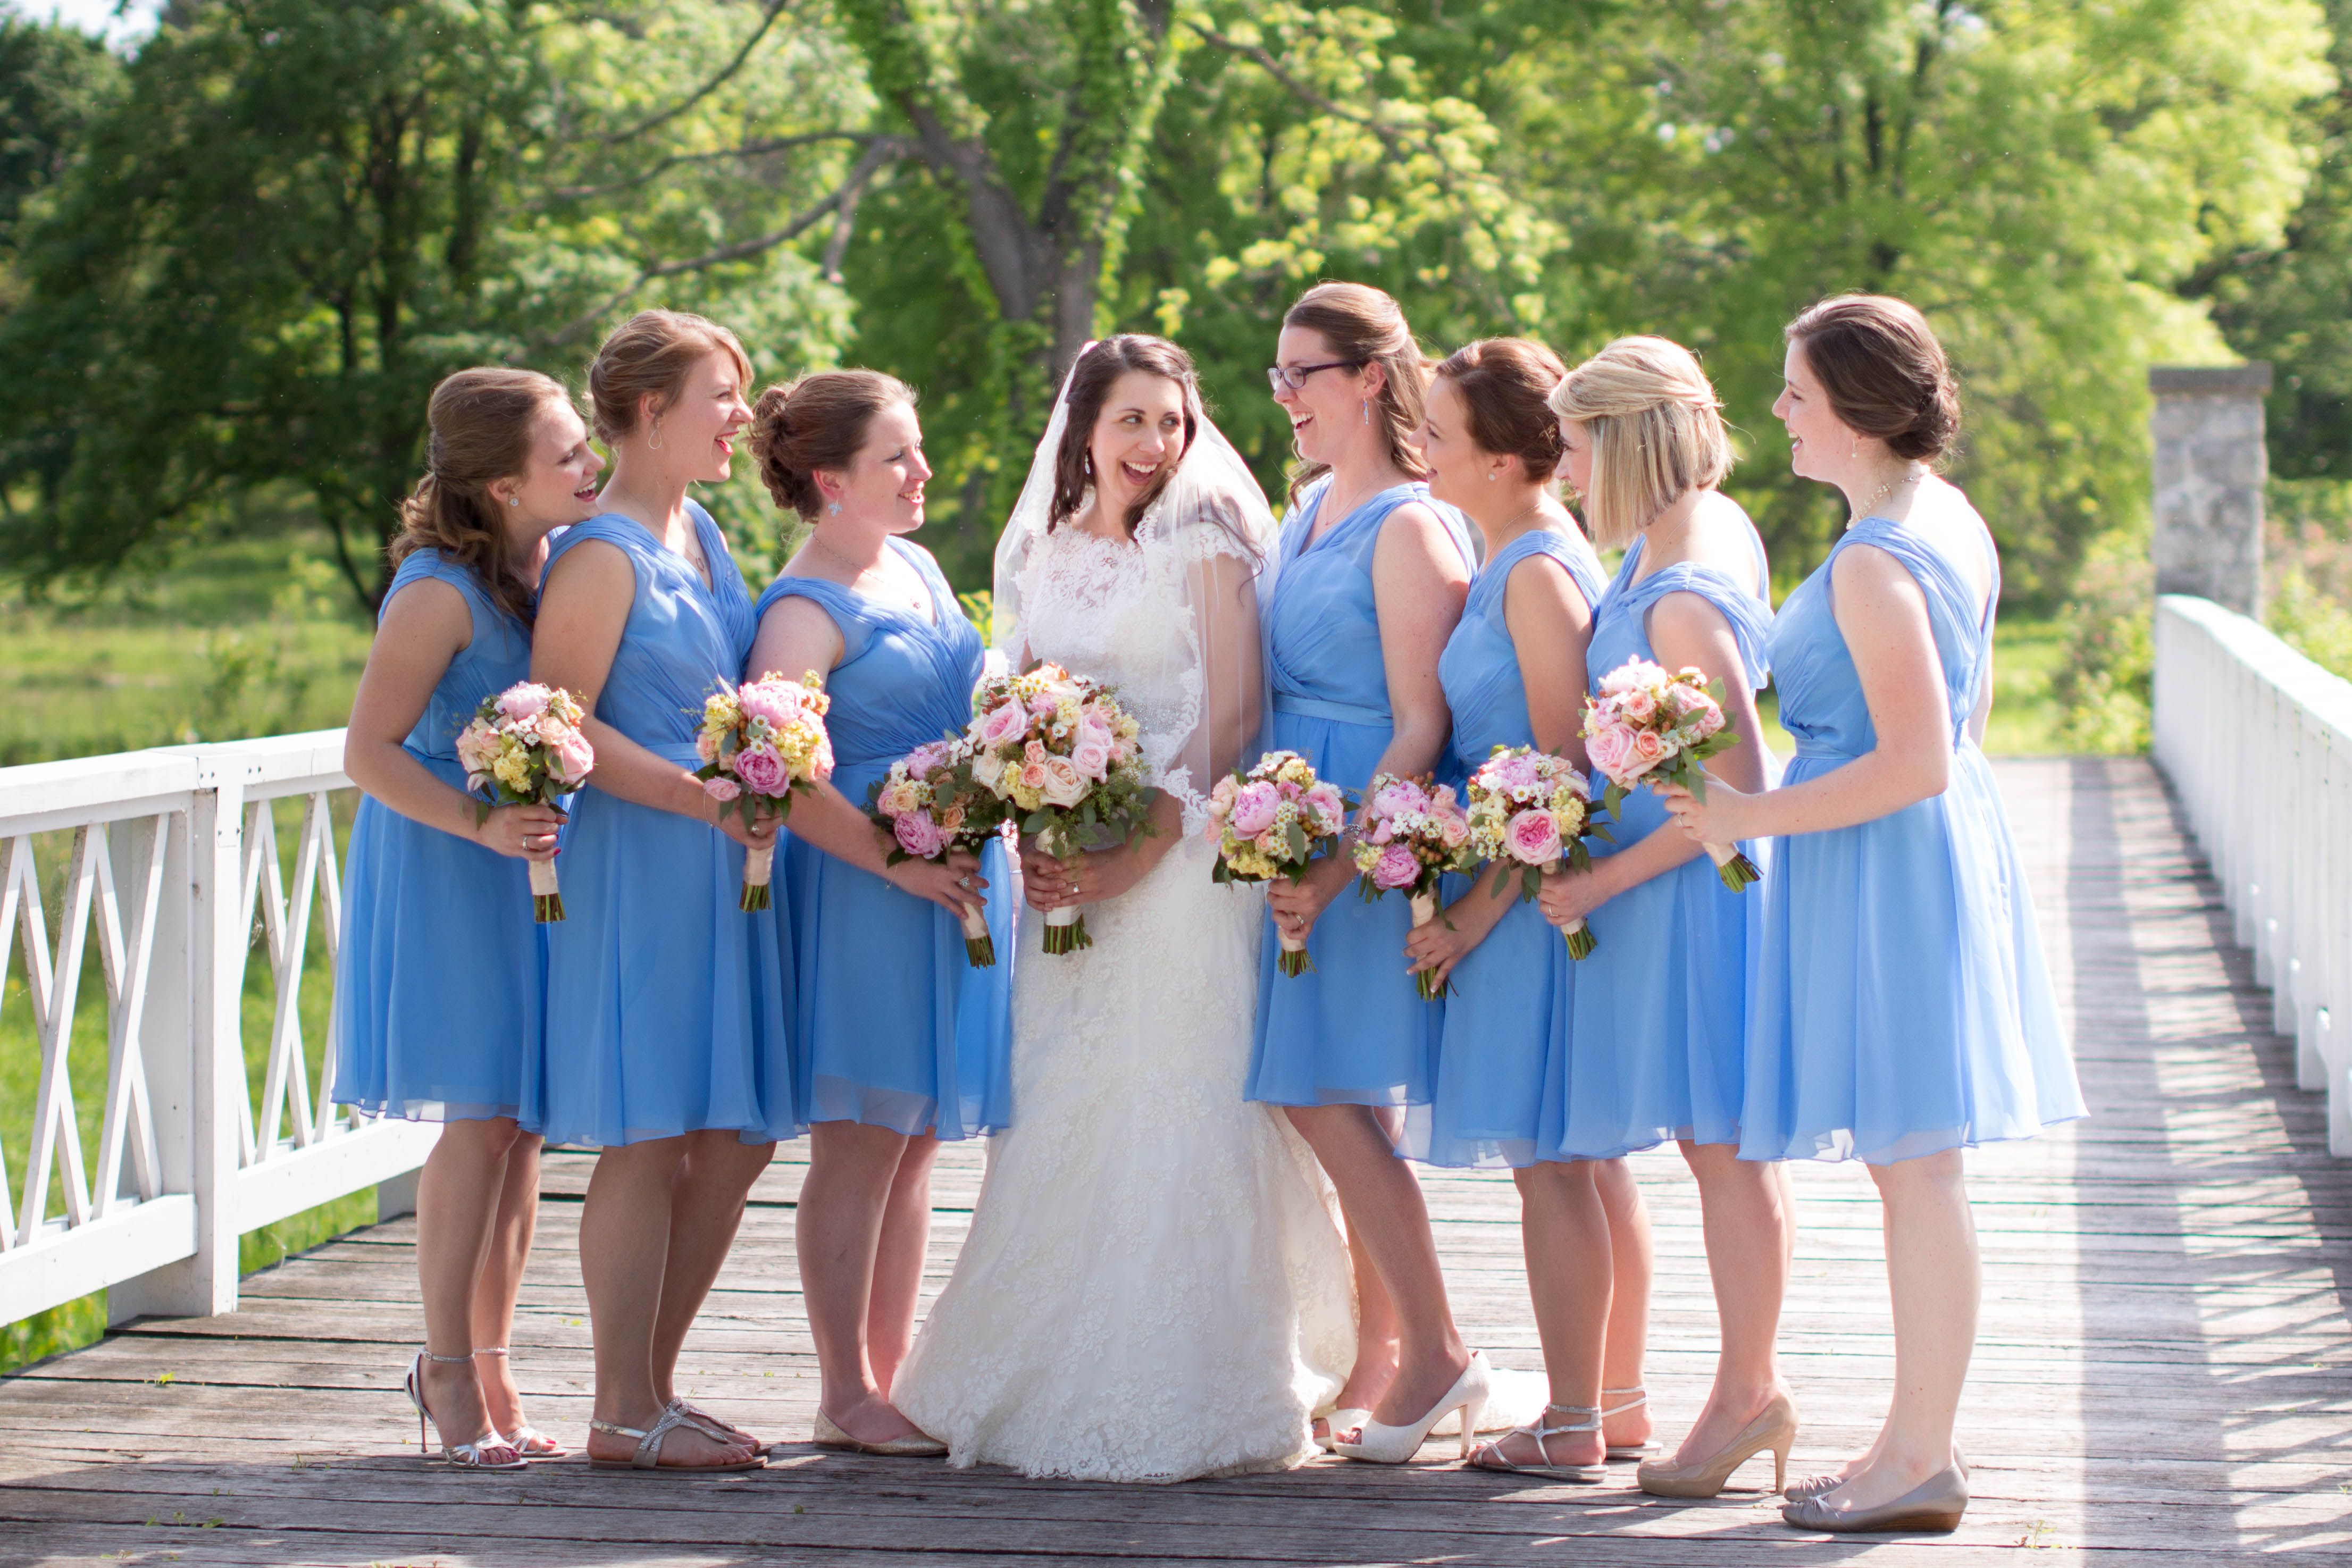 Jennifer Claire Photography Abbey Farms Wedding Nagel Emporium Aurora Il Wedding Dresses Bridesmaid Dresses Wedding Photographers